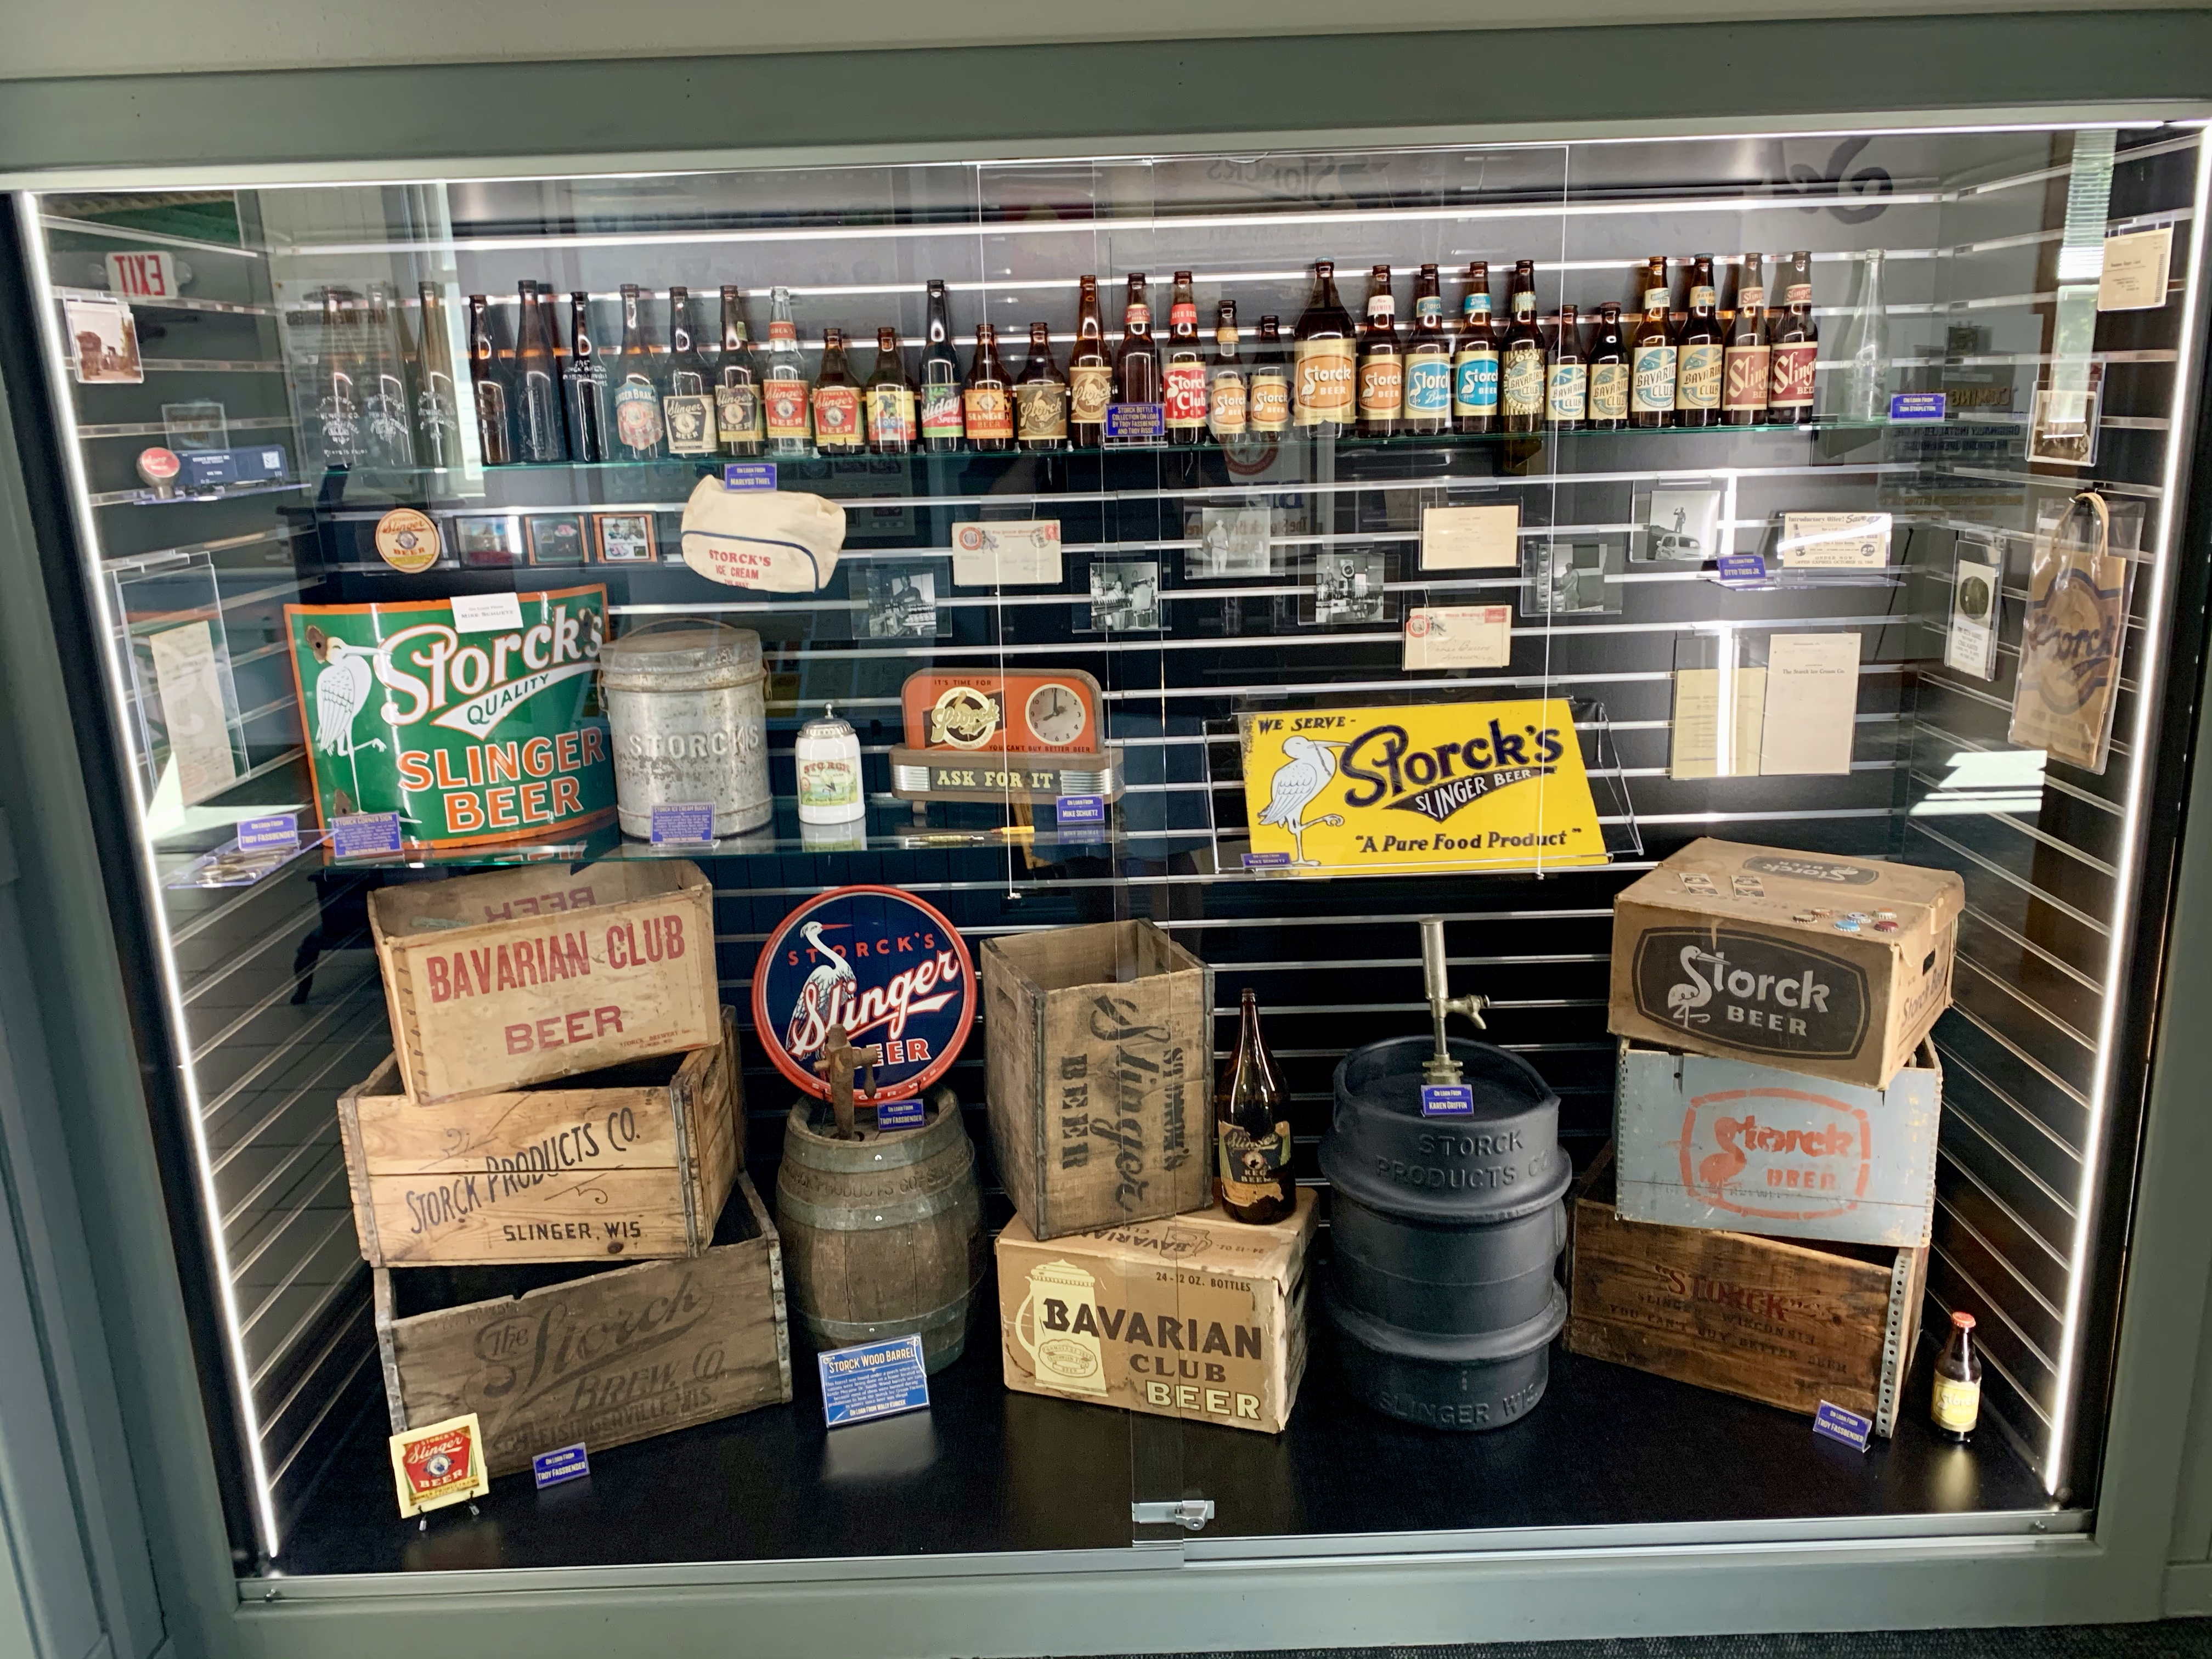 Grocery store, Convenience store, Liquor store, Refrigerator